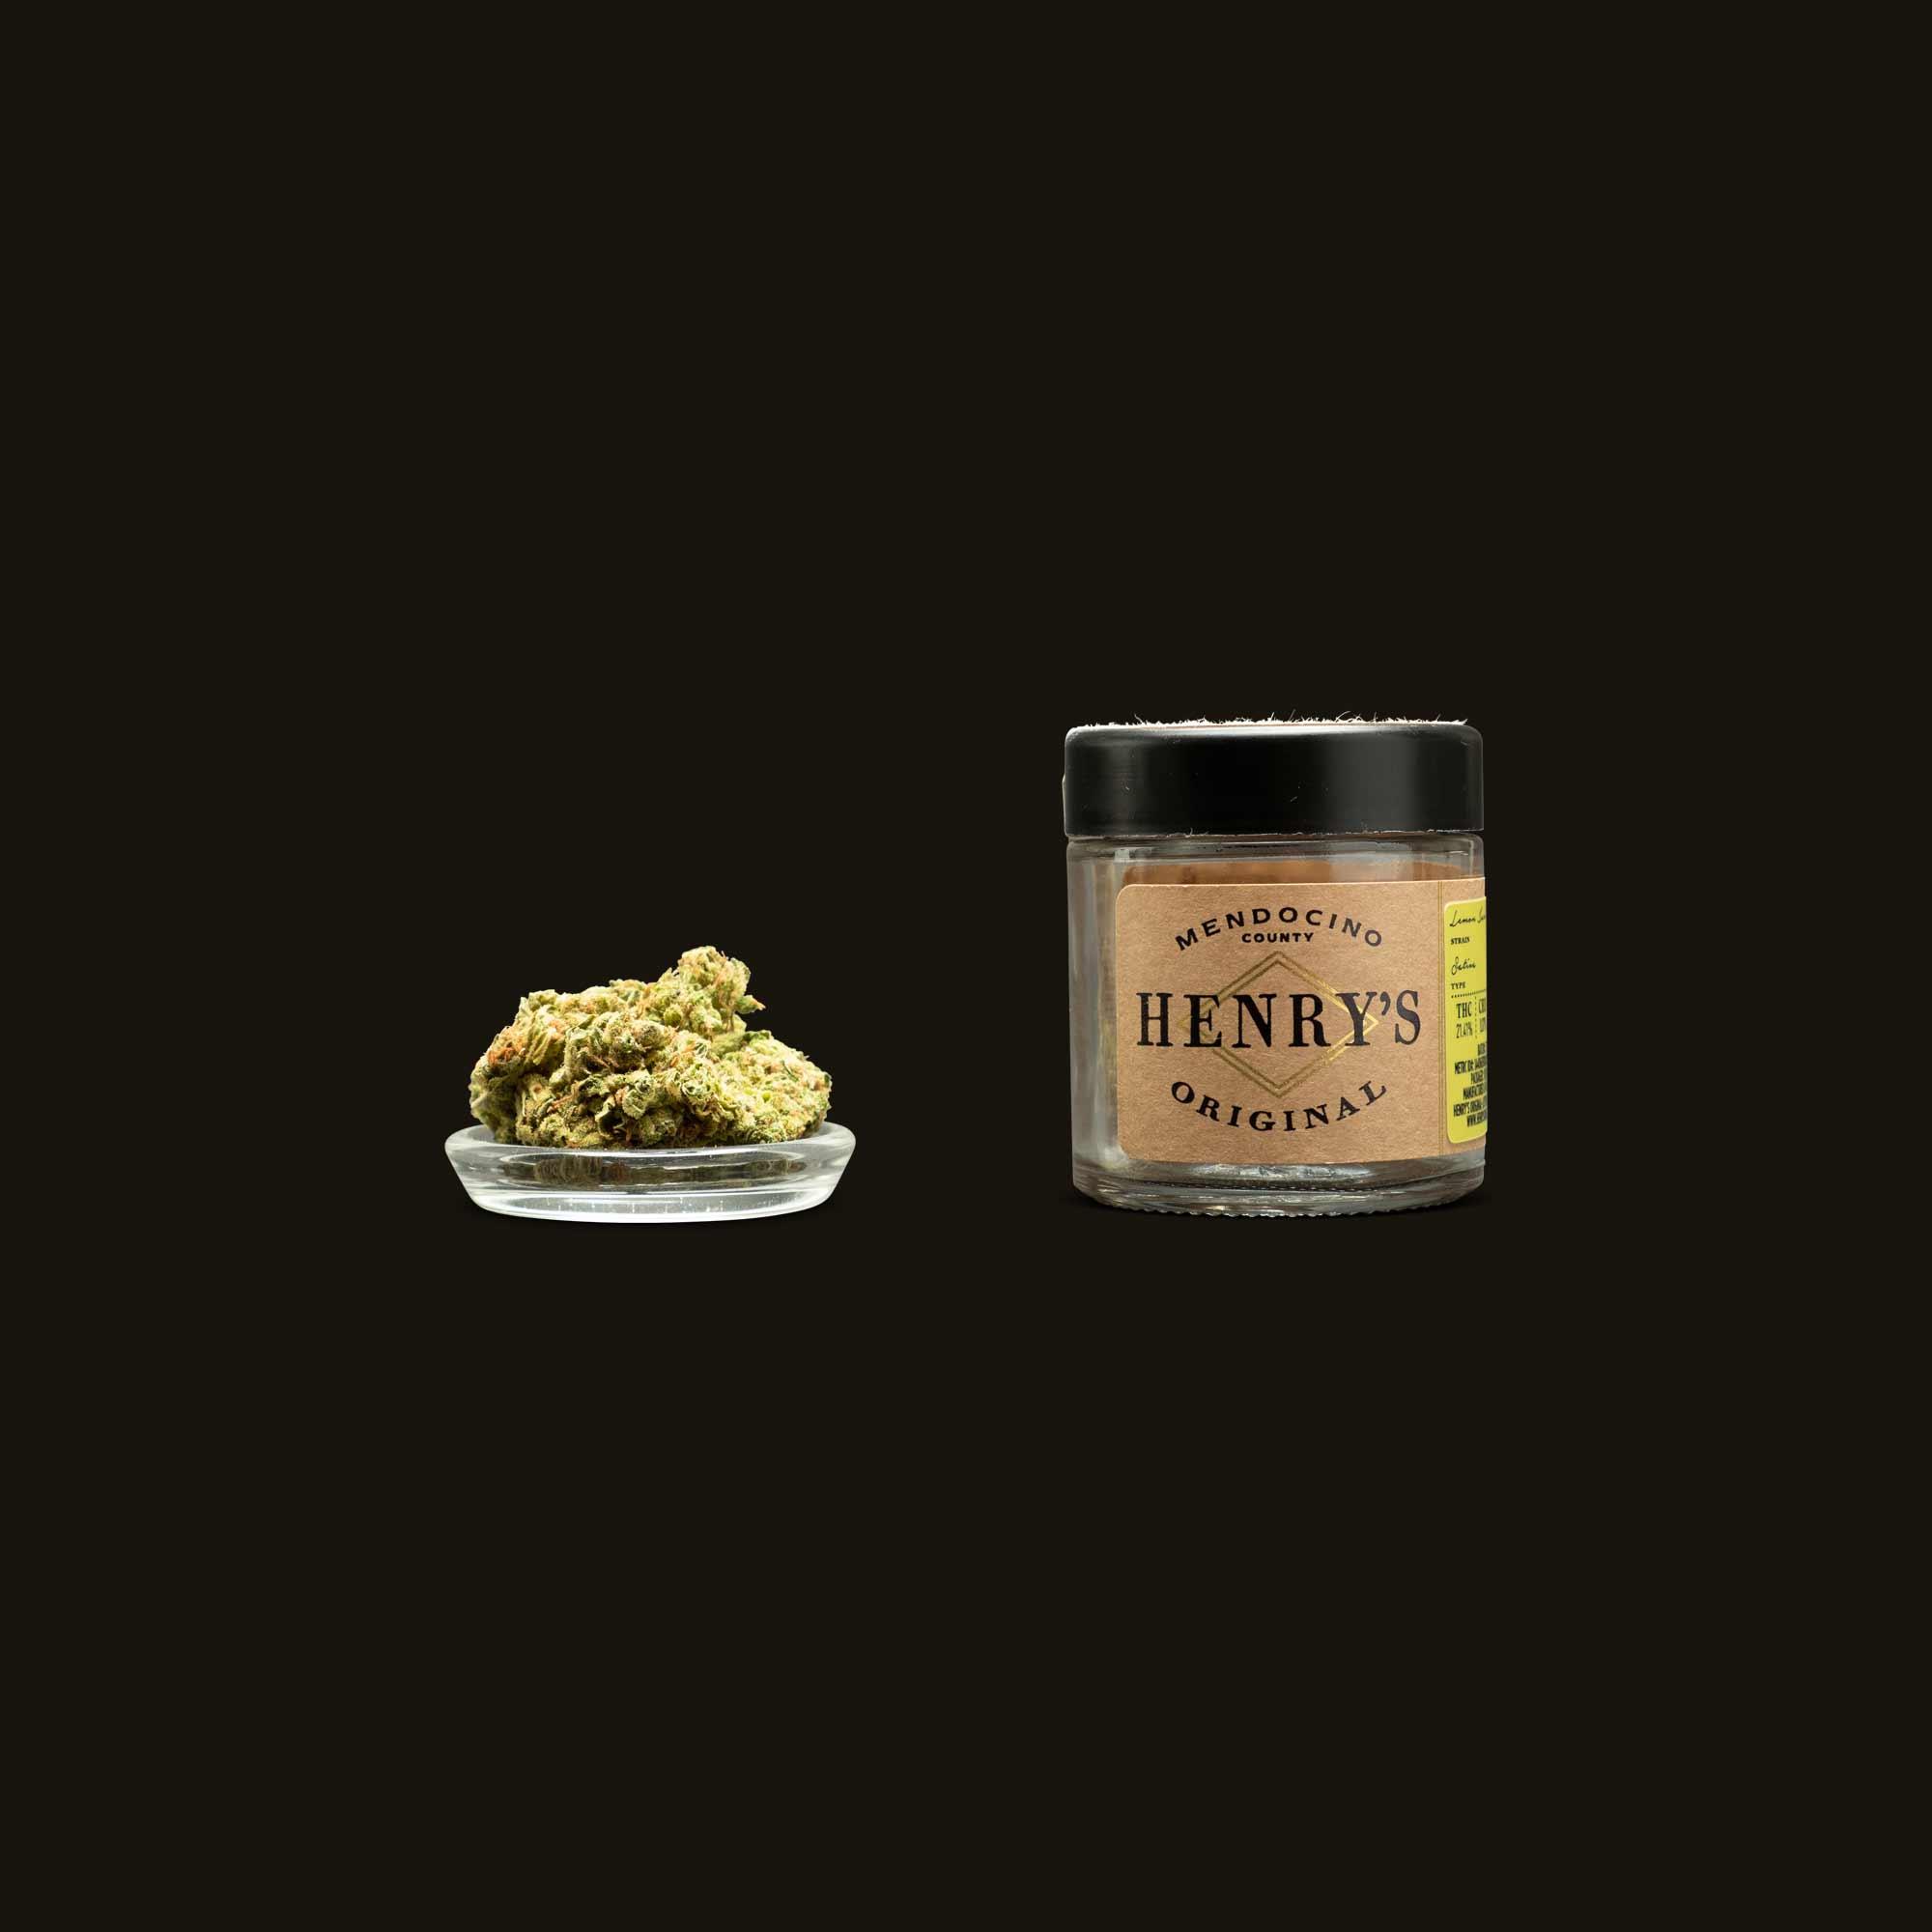 Henry's Original Lemon Jack